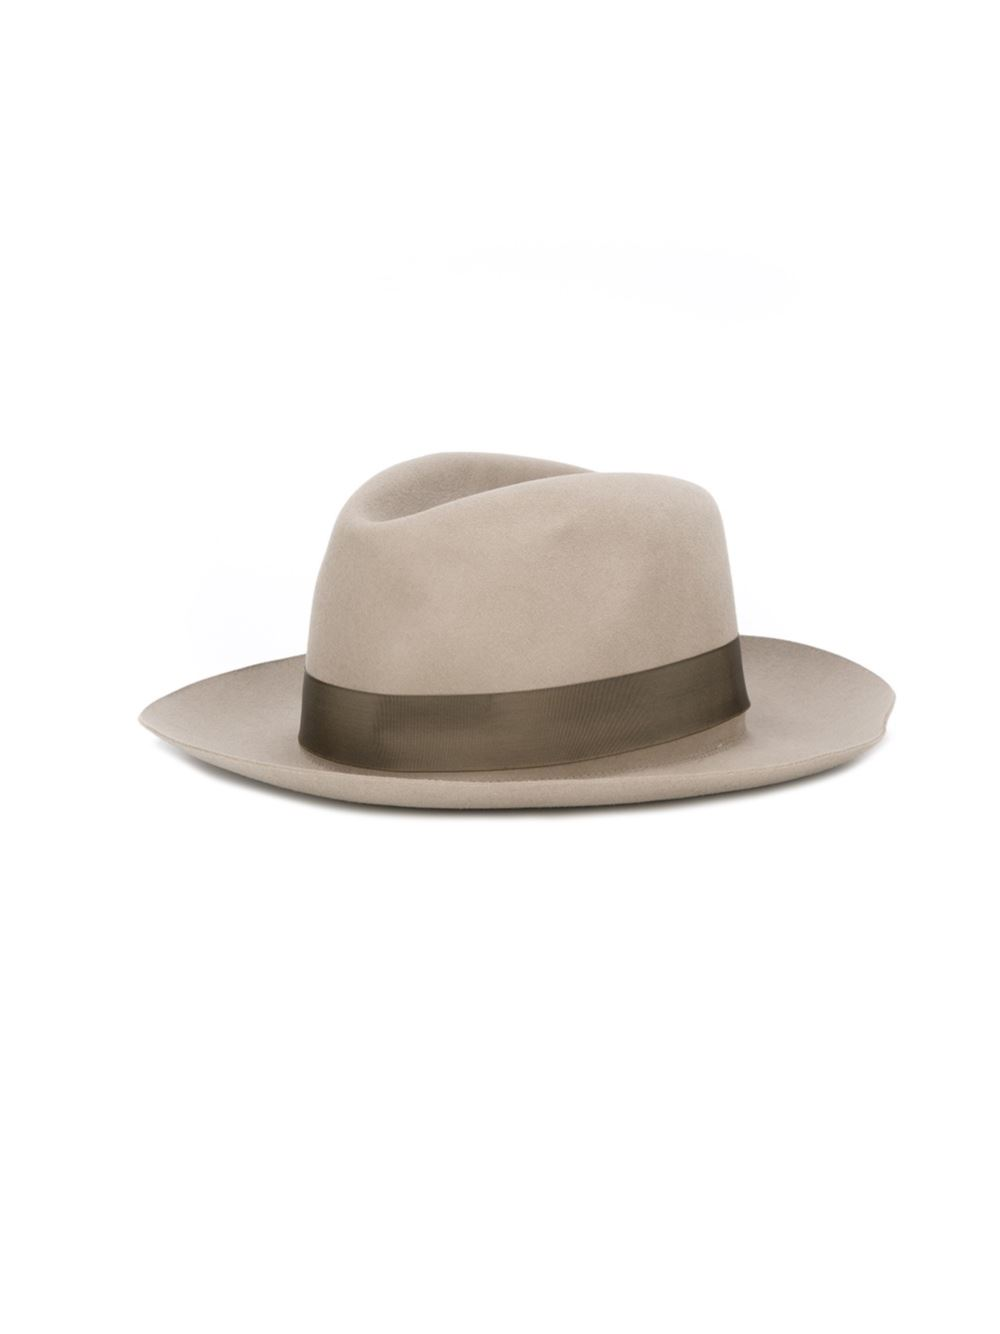 Salvatore Ferragamo fedora hat.jpg